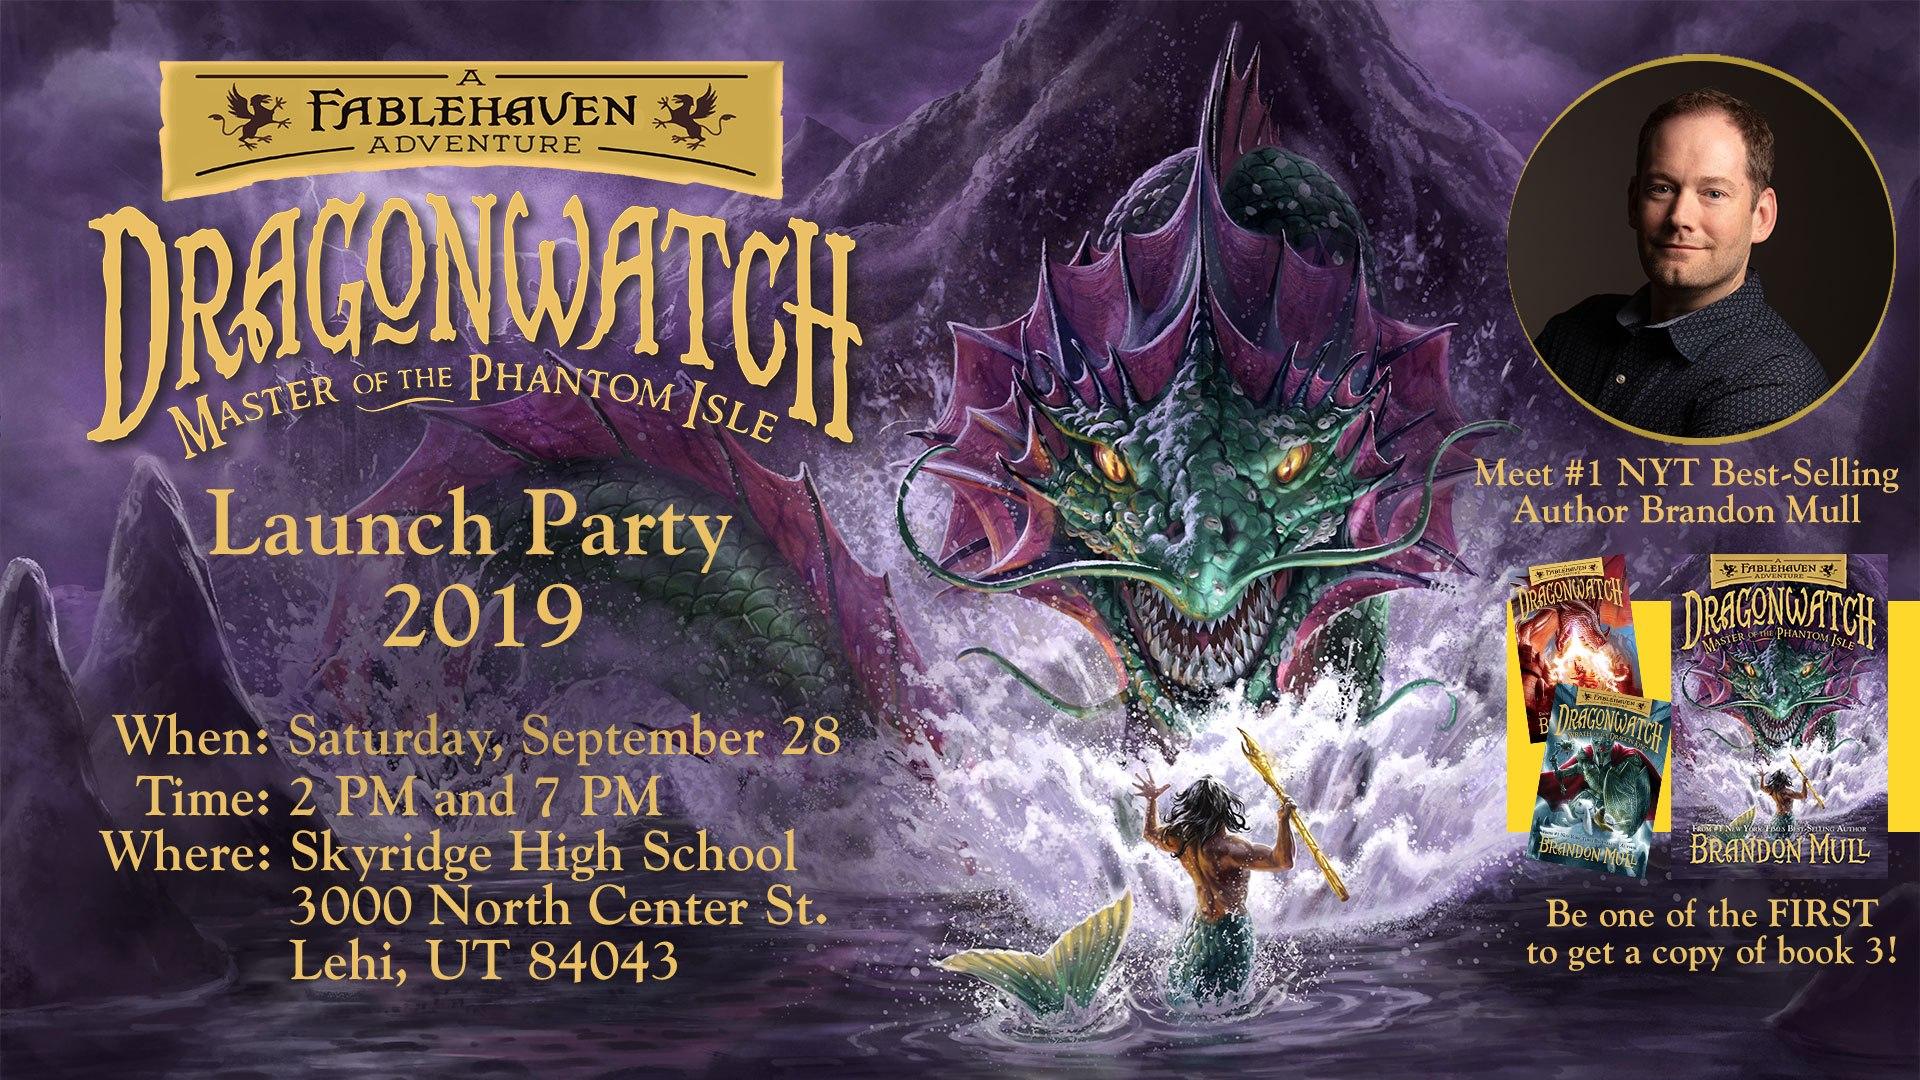 dragonwatch 3 event